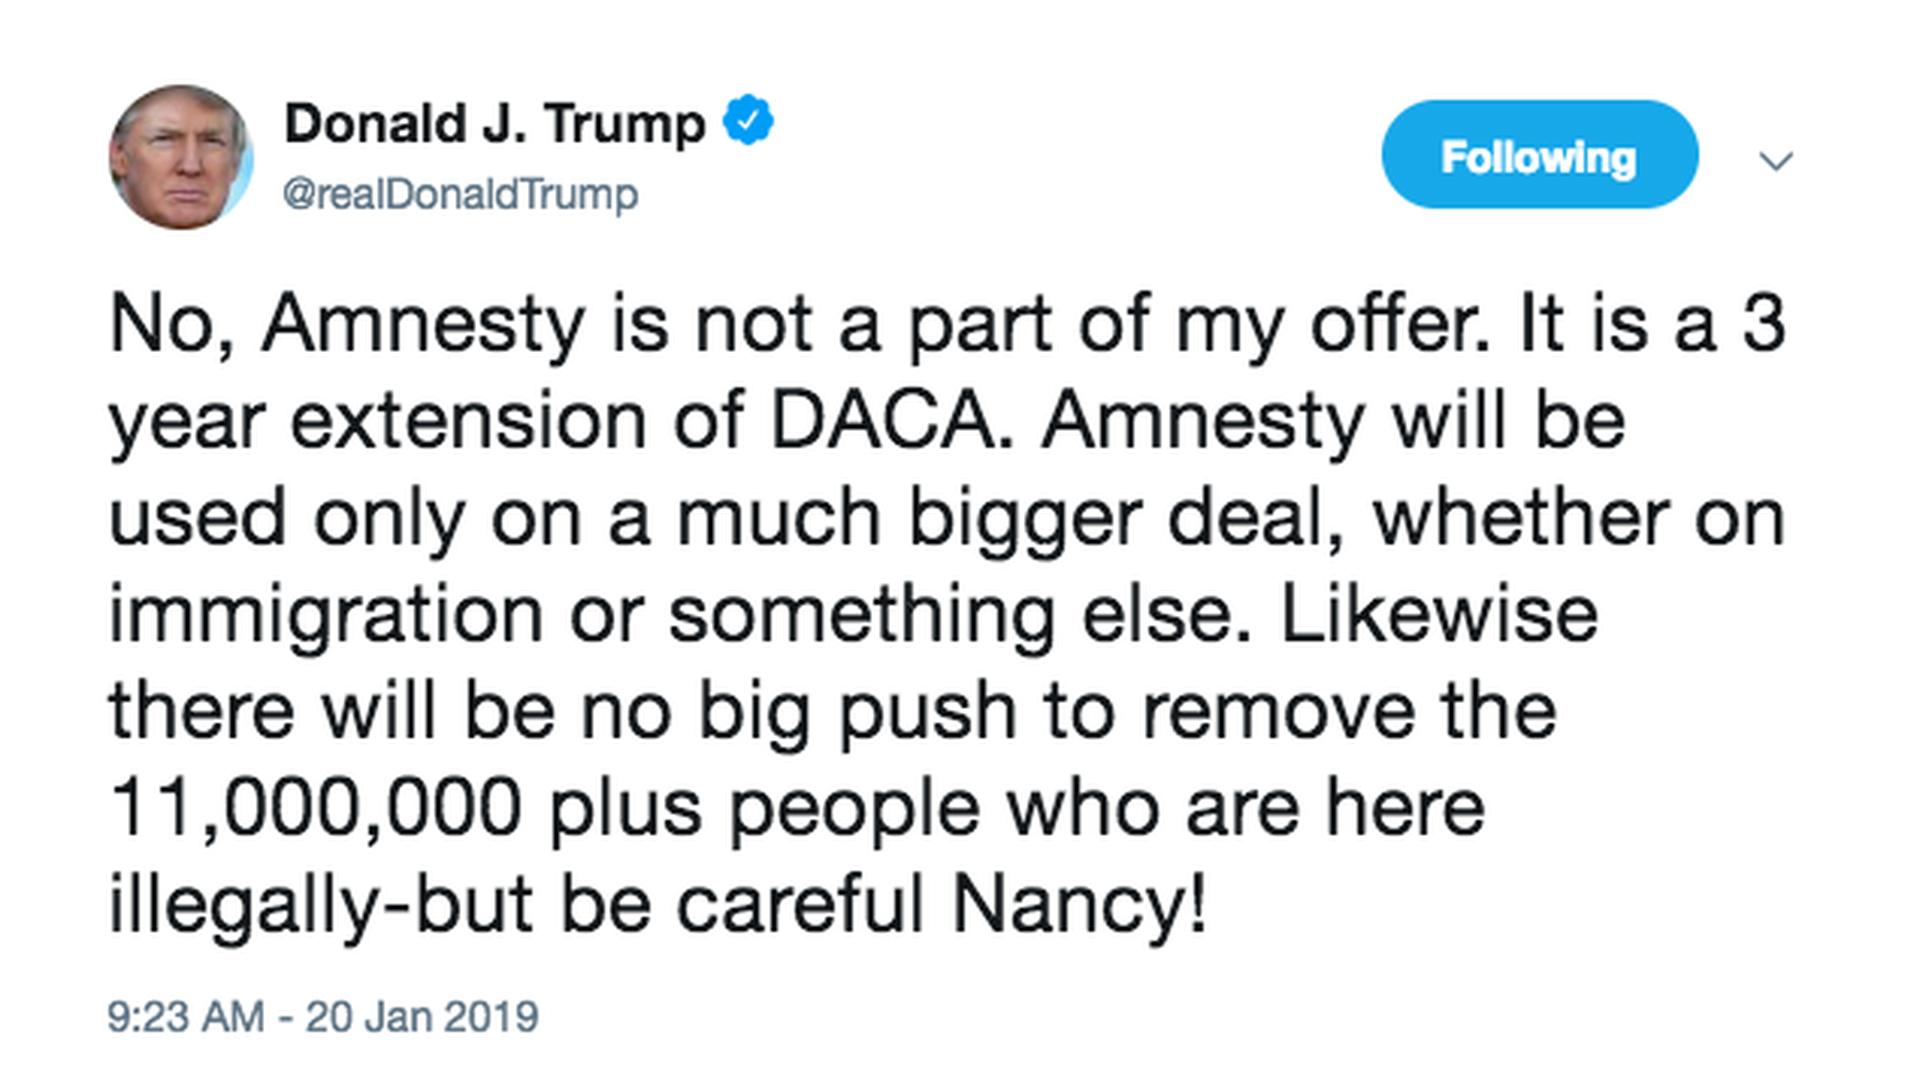 Trump issues veiled deportation threat over shutdown negotiations